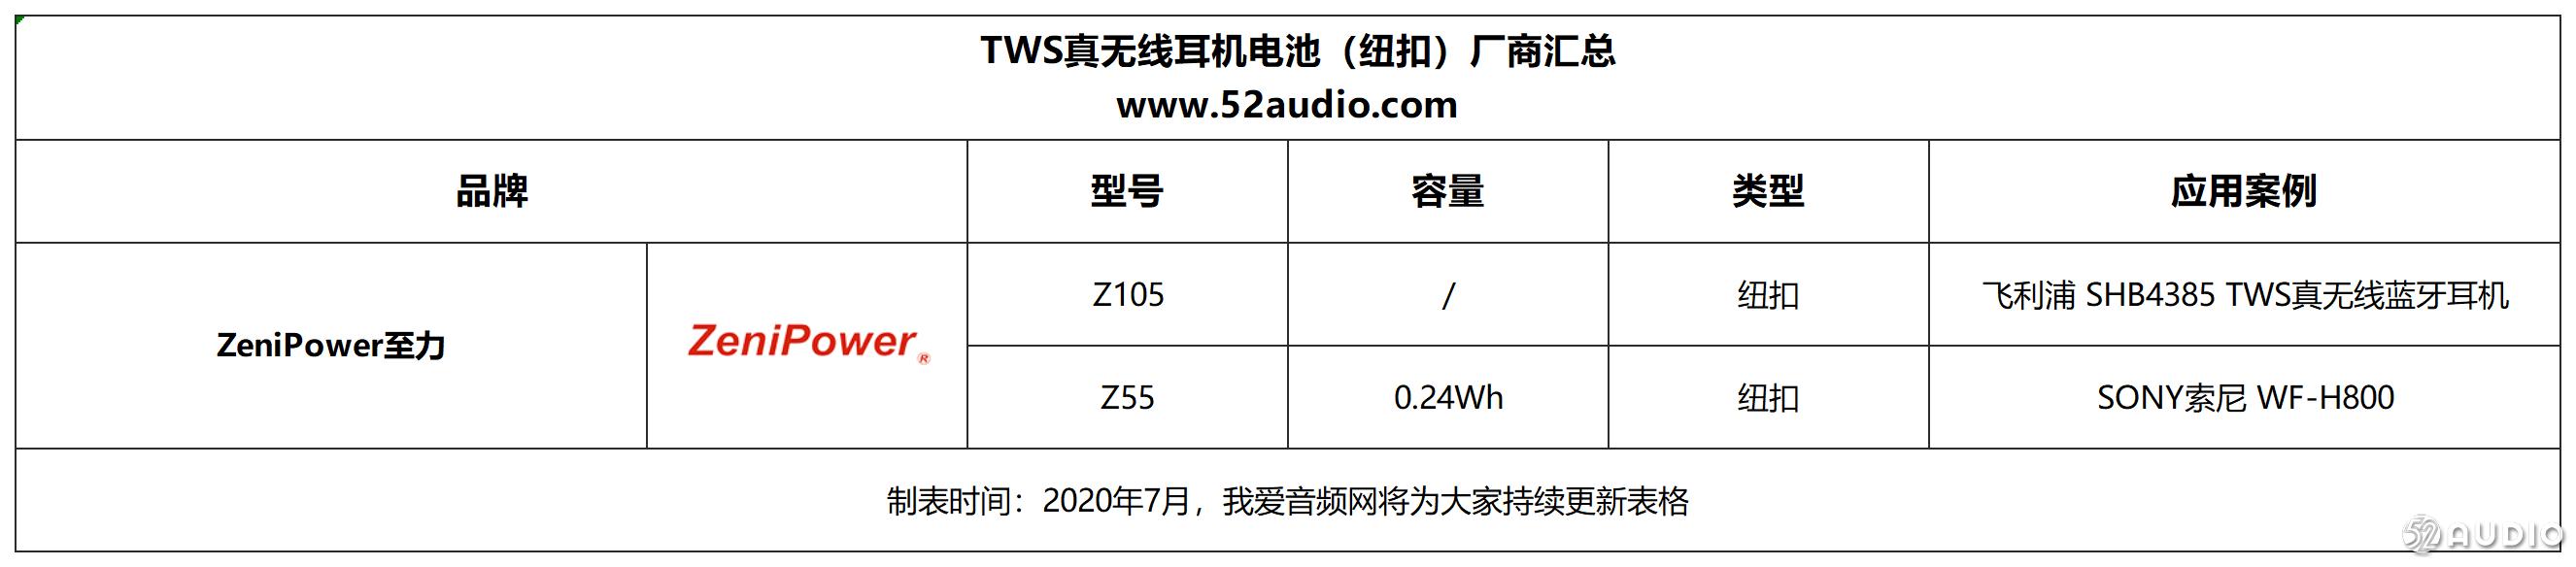 iPhone 12不标配耳机,17家电池(纽扣)厂商将获益-我爱音频网